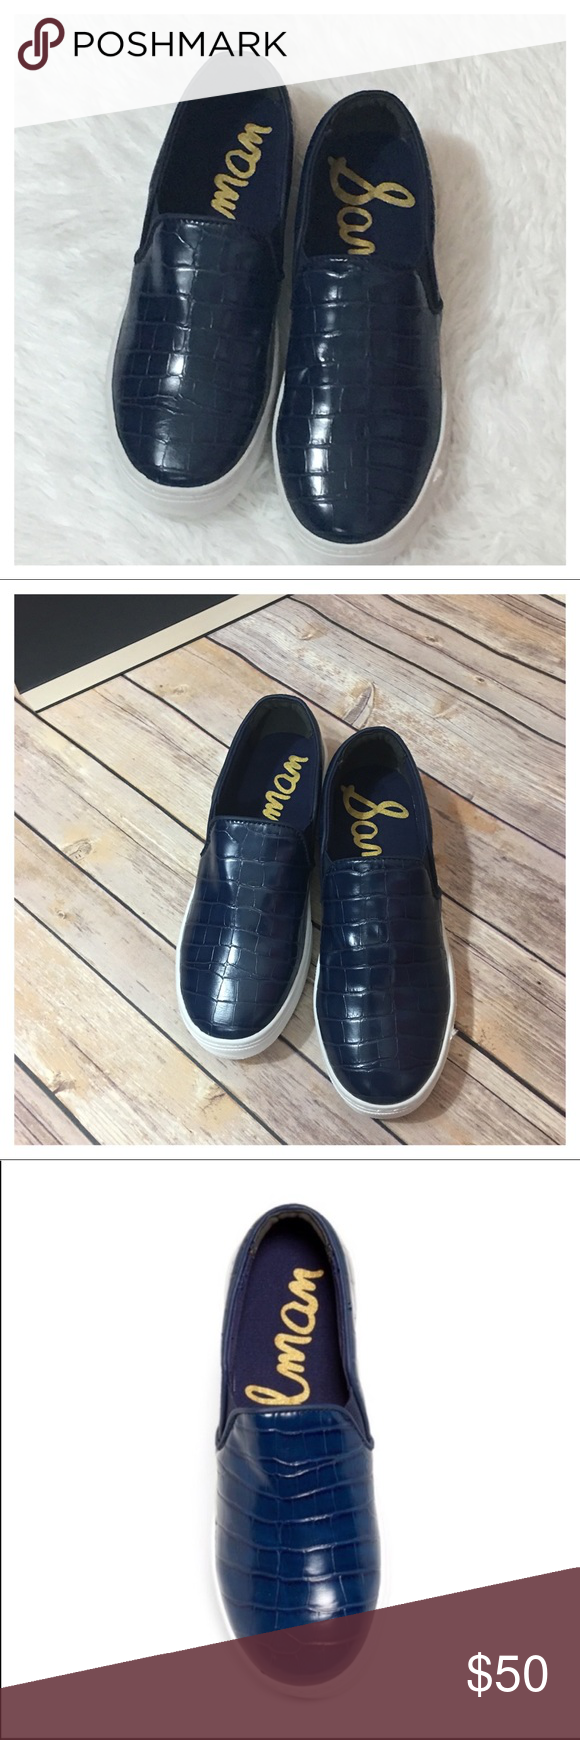 652ee0f638cd NWOB Sam Edelman Lacey Slip-On Platform Sneaker